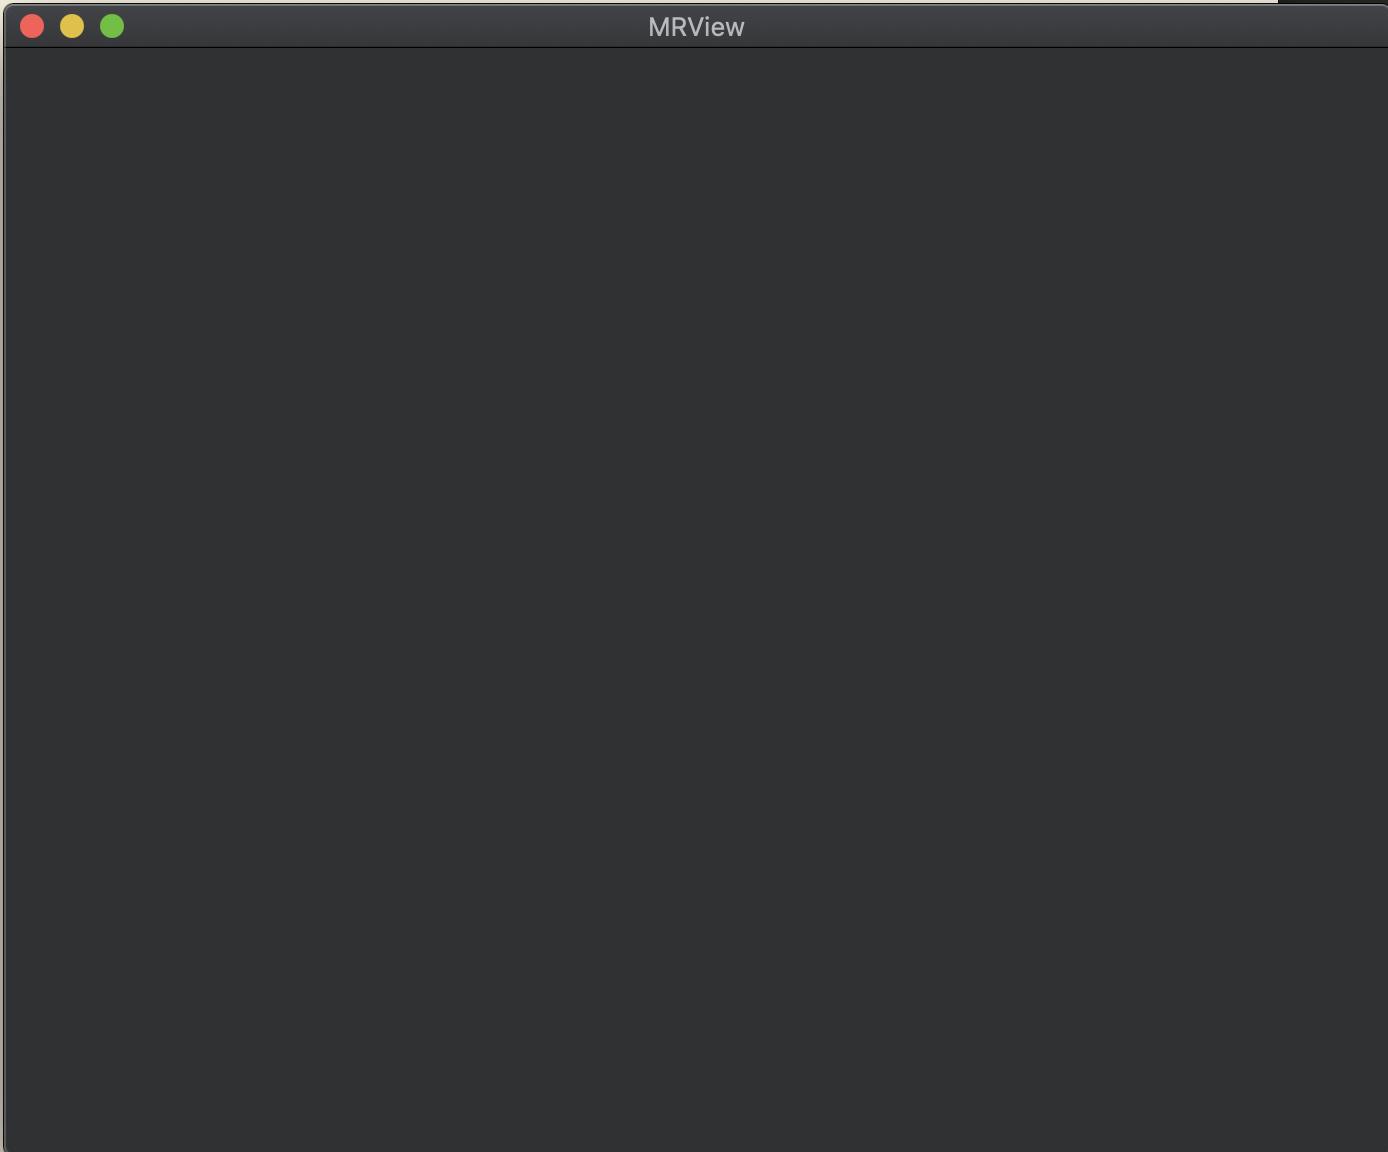 Help installing in macos mojave 10 14 2 - MRtrix3 Community